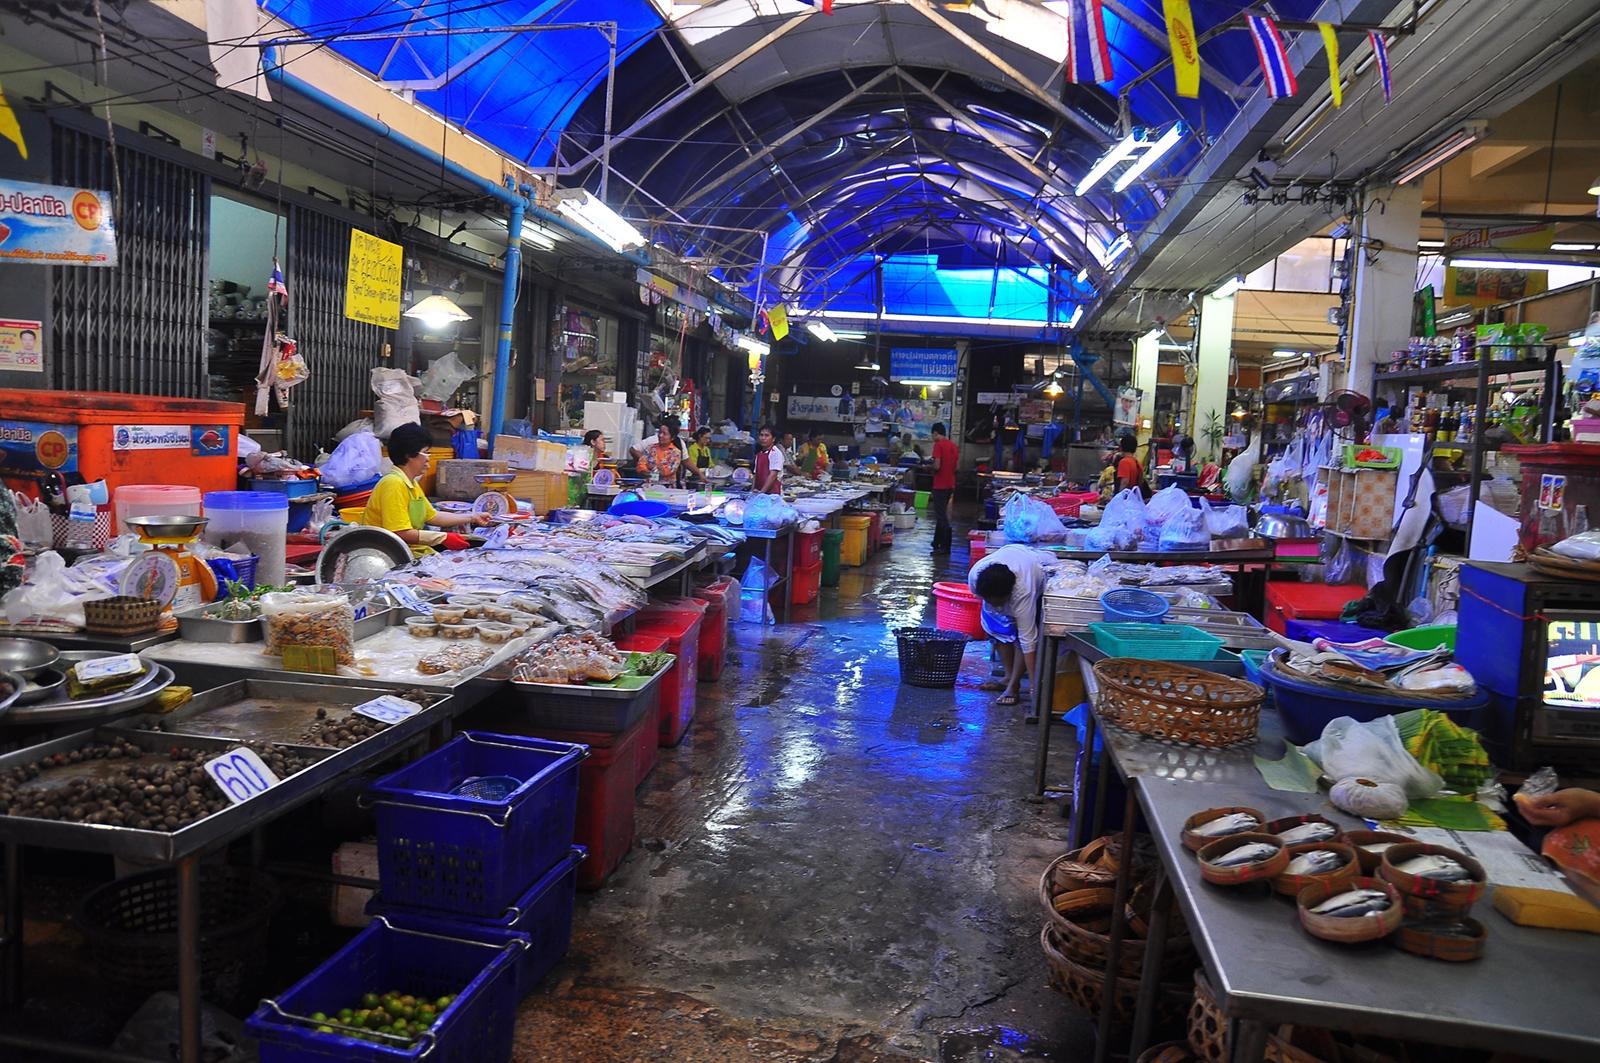 Hua Hin's Chatchai Market